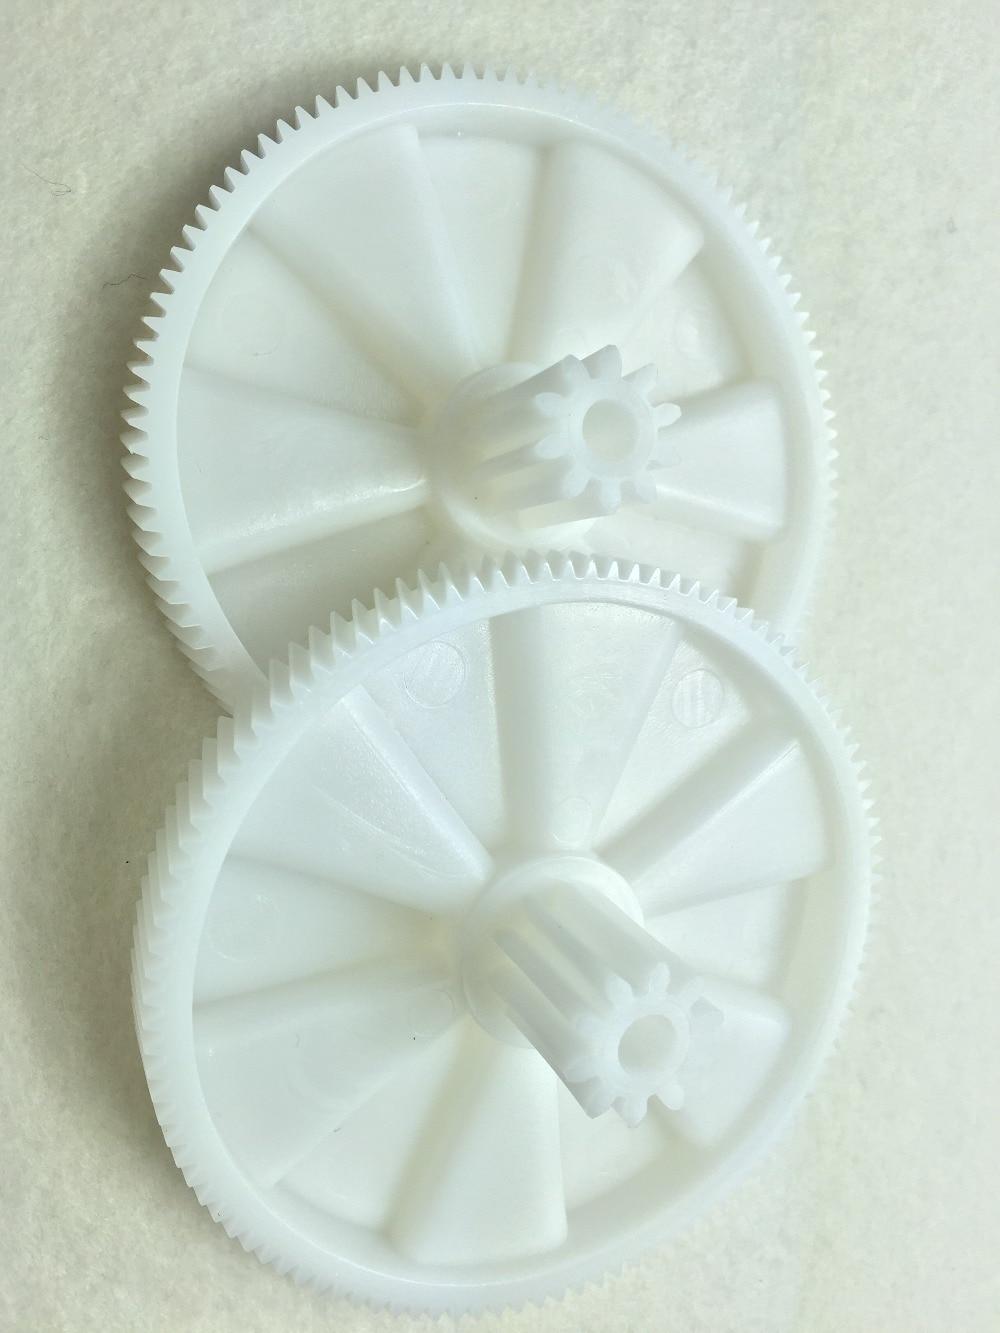 2piece Kenwood Meat Grinder Parts Gear Plastic Gear Fit MG300 400/450/470/500/510/511/515/516/517/520,PG500/520 DELONGHI KMG1200